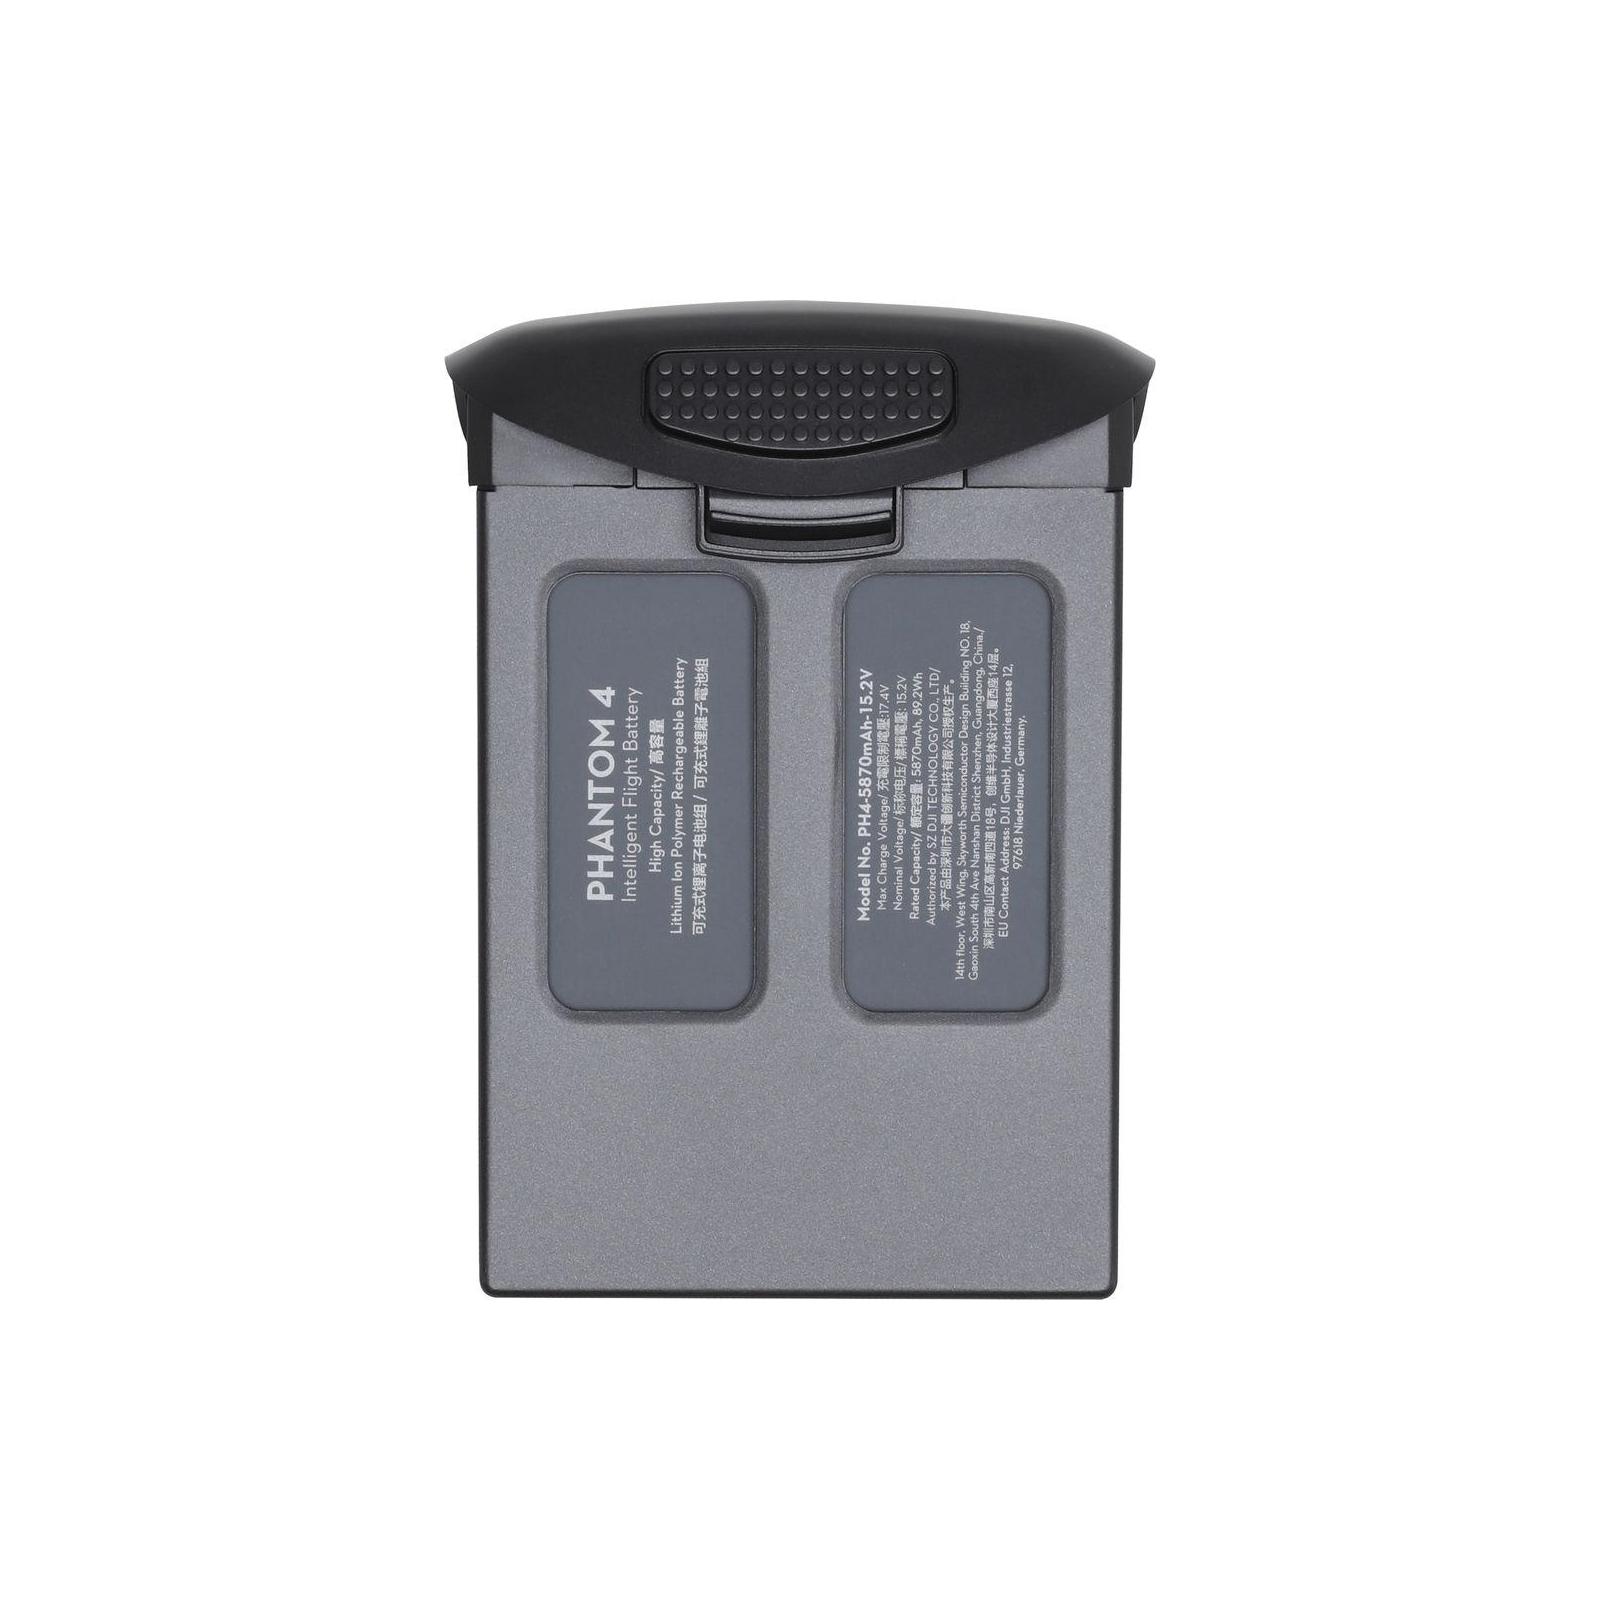 Аккумулятор для дрона DJI Phamtom 4 5870mAh (CP.PT.00000033.01)